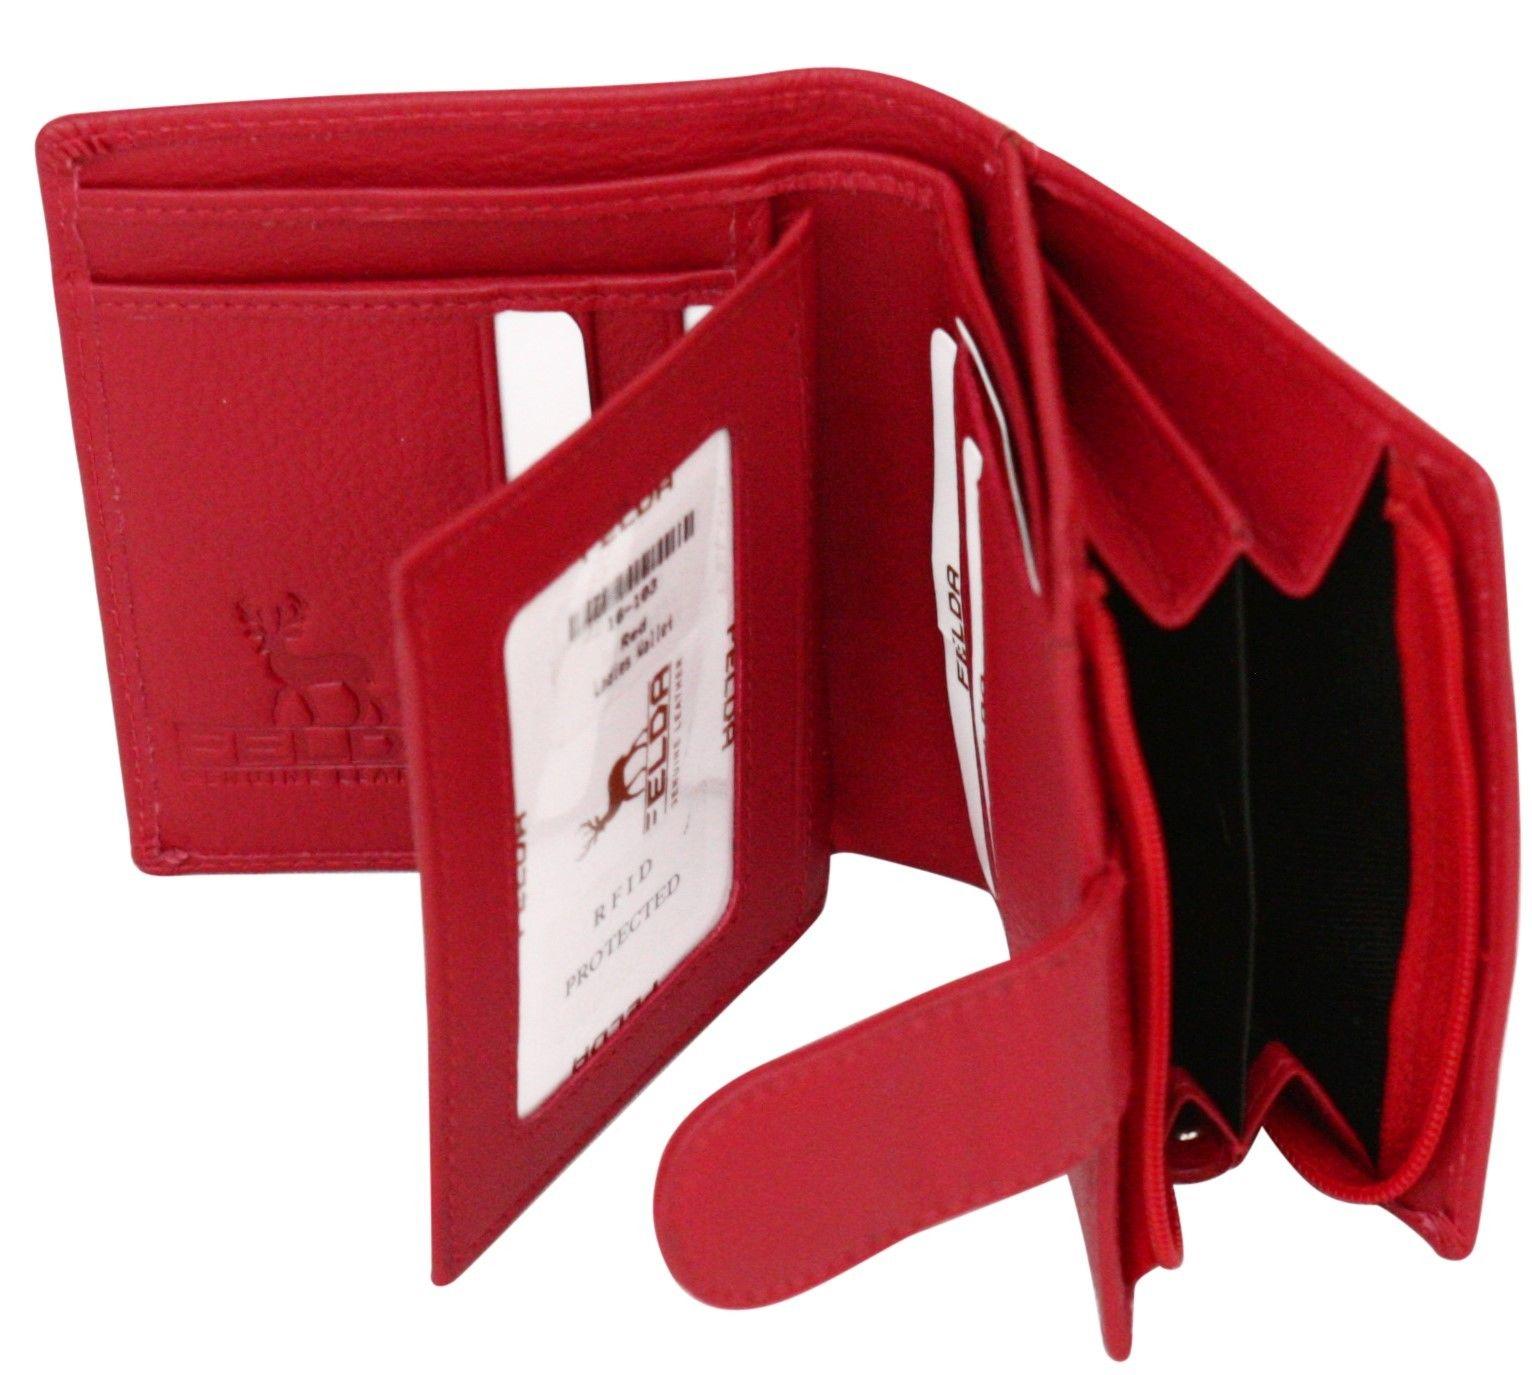 Felda-RFID-onorevoli-MEDAGLIA-amp-Card-Purse-Wallet-Genuine-Leather-Multi-SOFT-BOX-REGALO miniatura 103